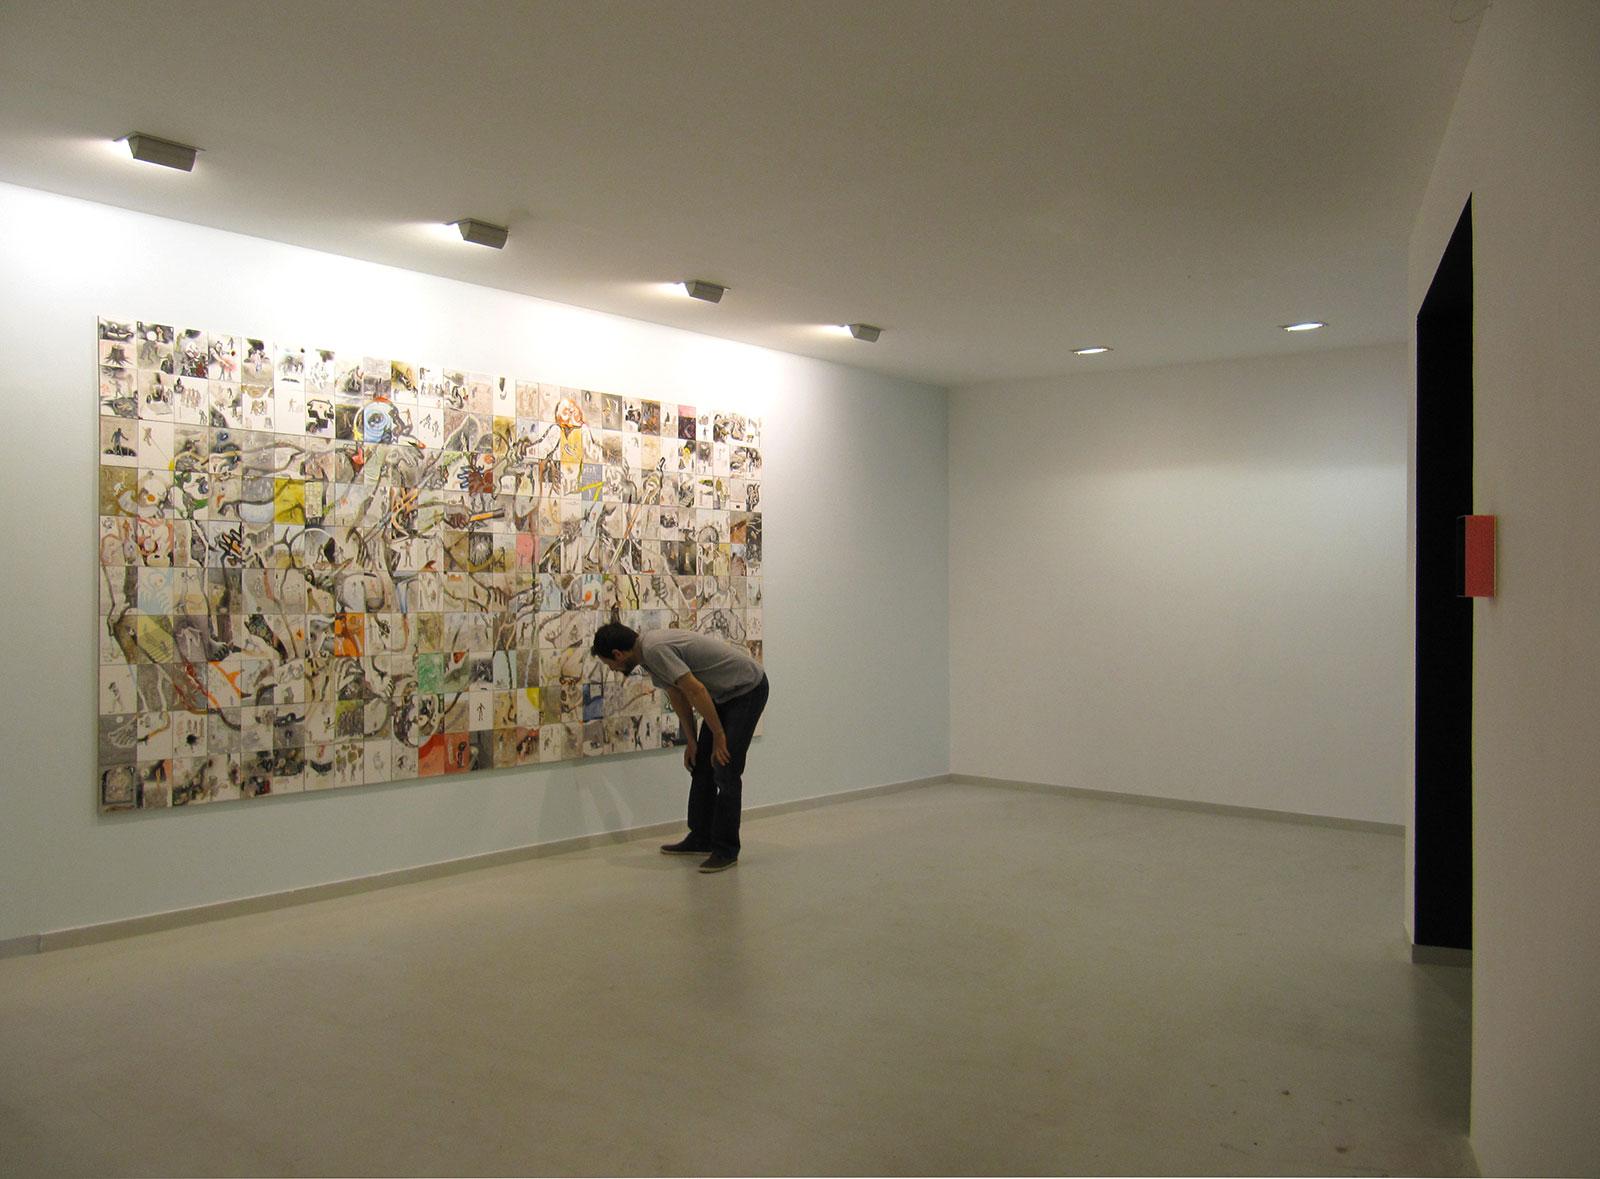 Overlook, Qbox gallery, general view, 2012